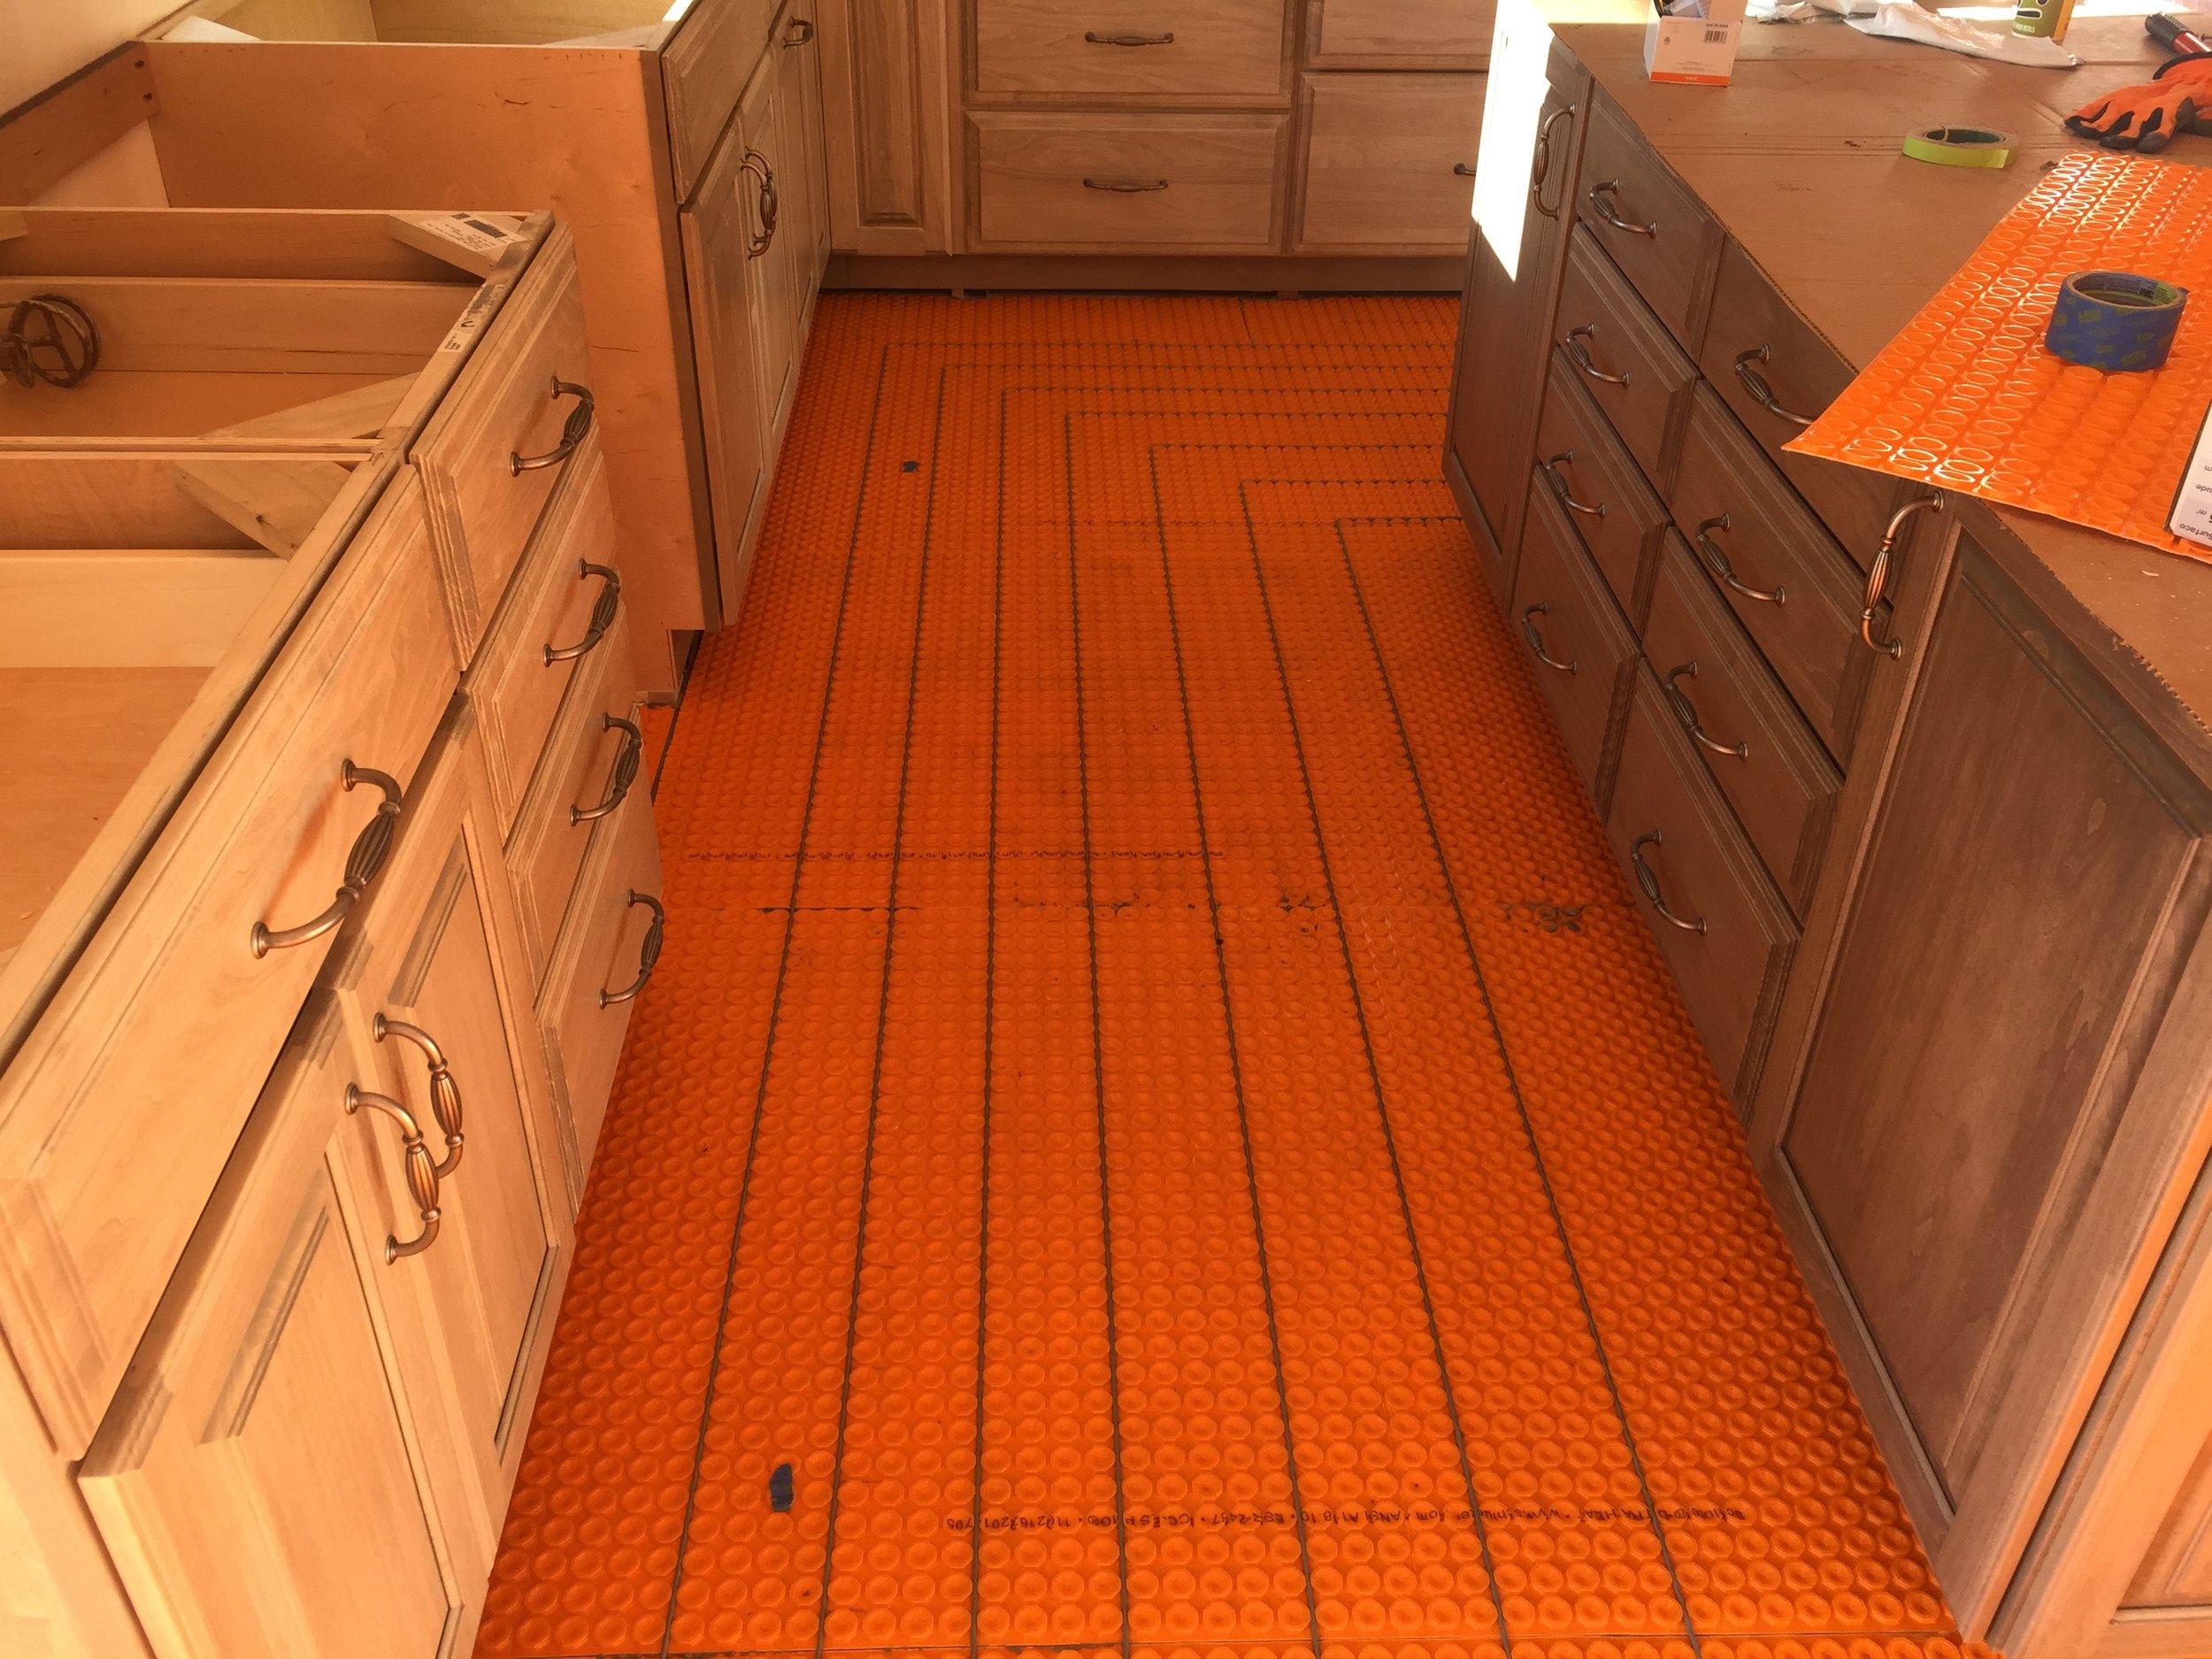 Underlayment for heated tile floors